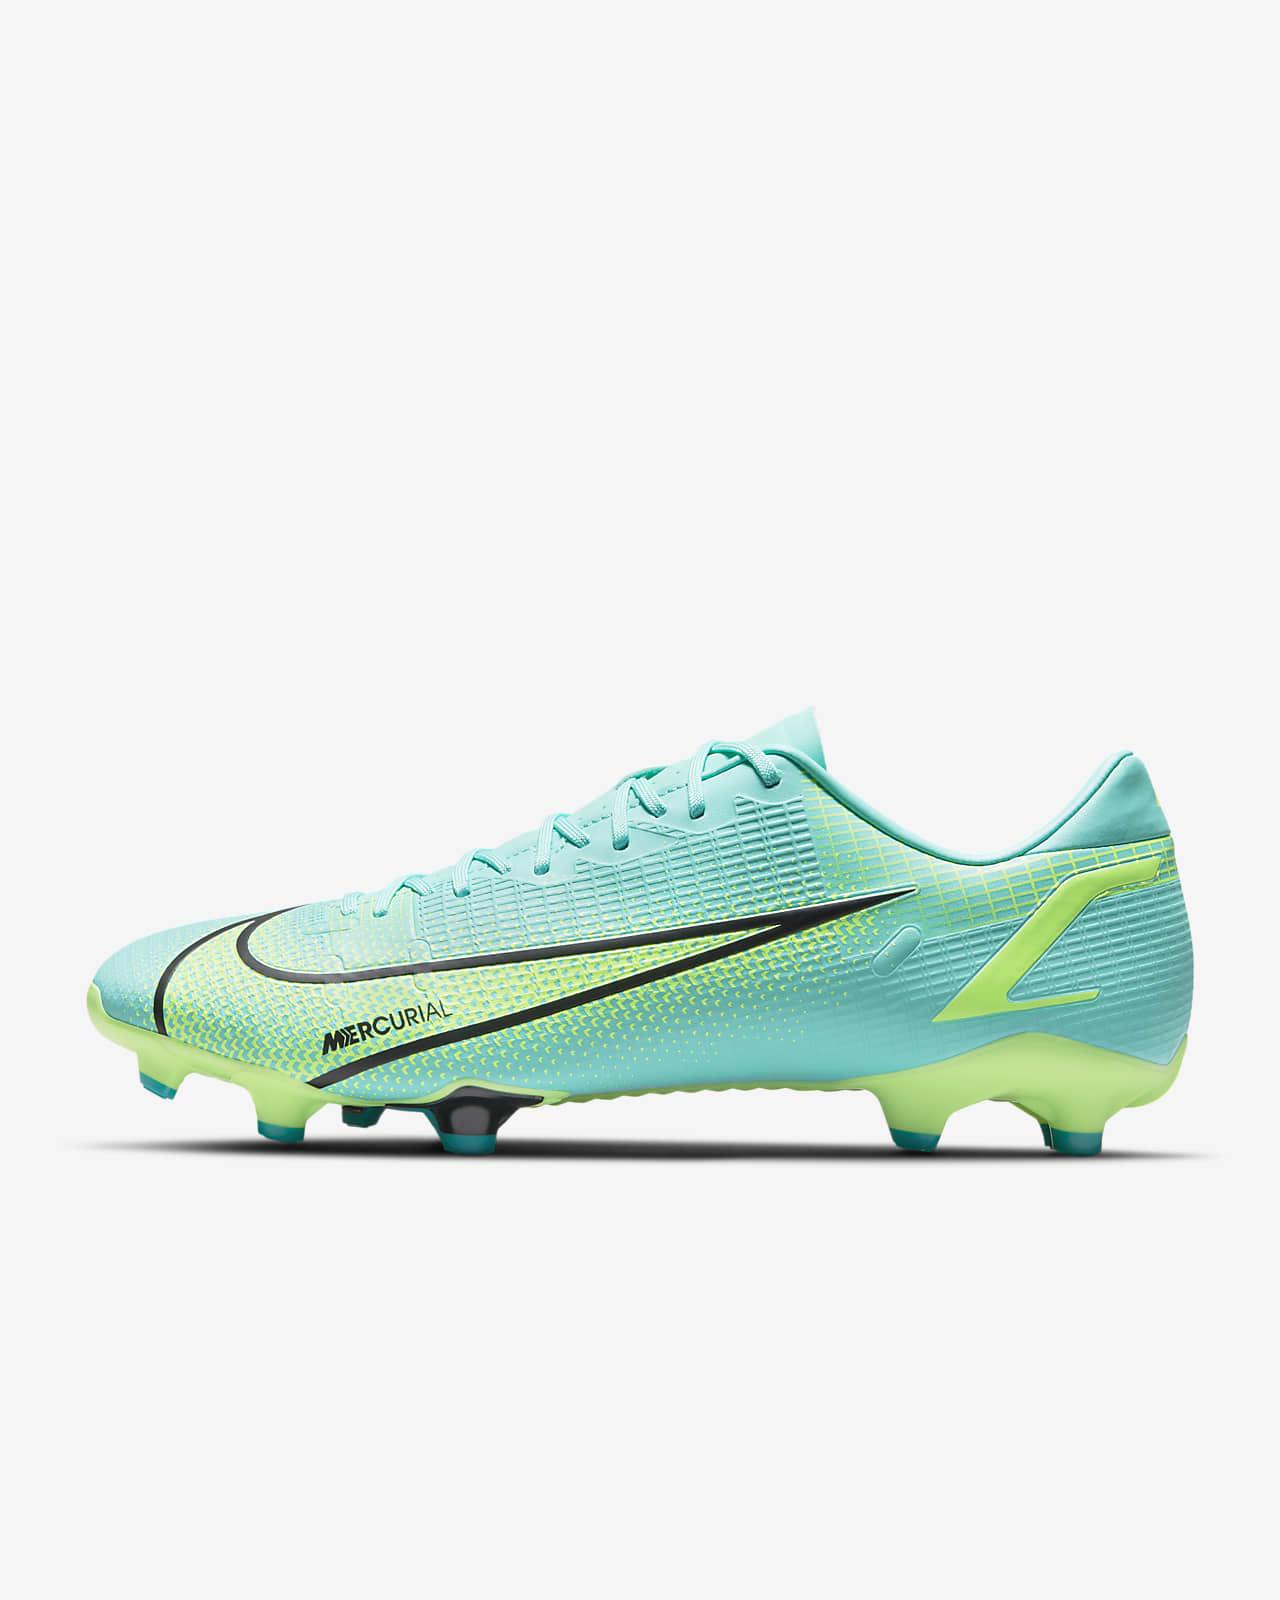 Nike Mercurial Vapor 14 Academy FG/MG-fodboldstøvle til flere typer underlag